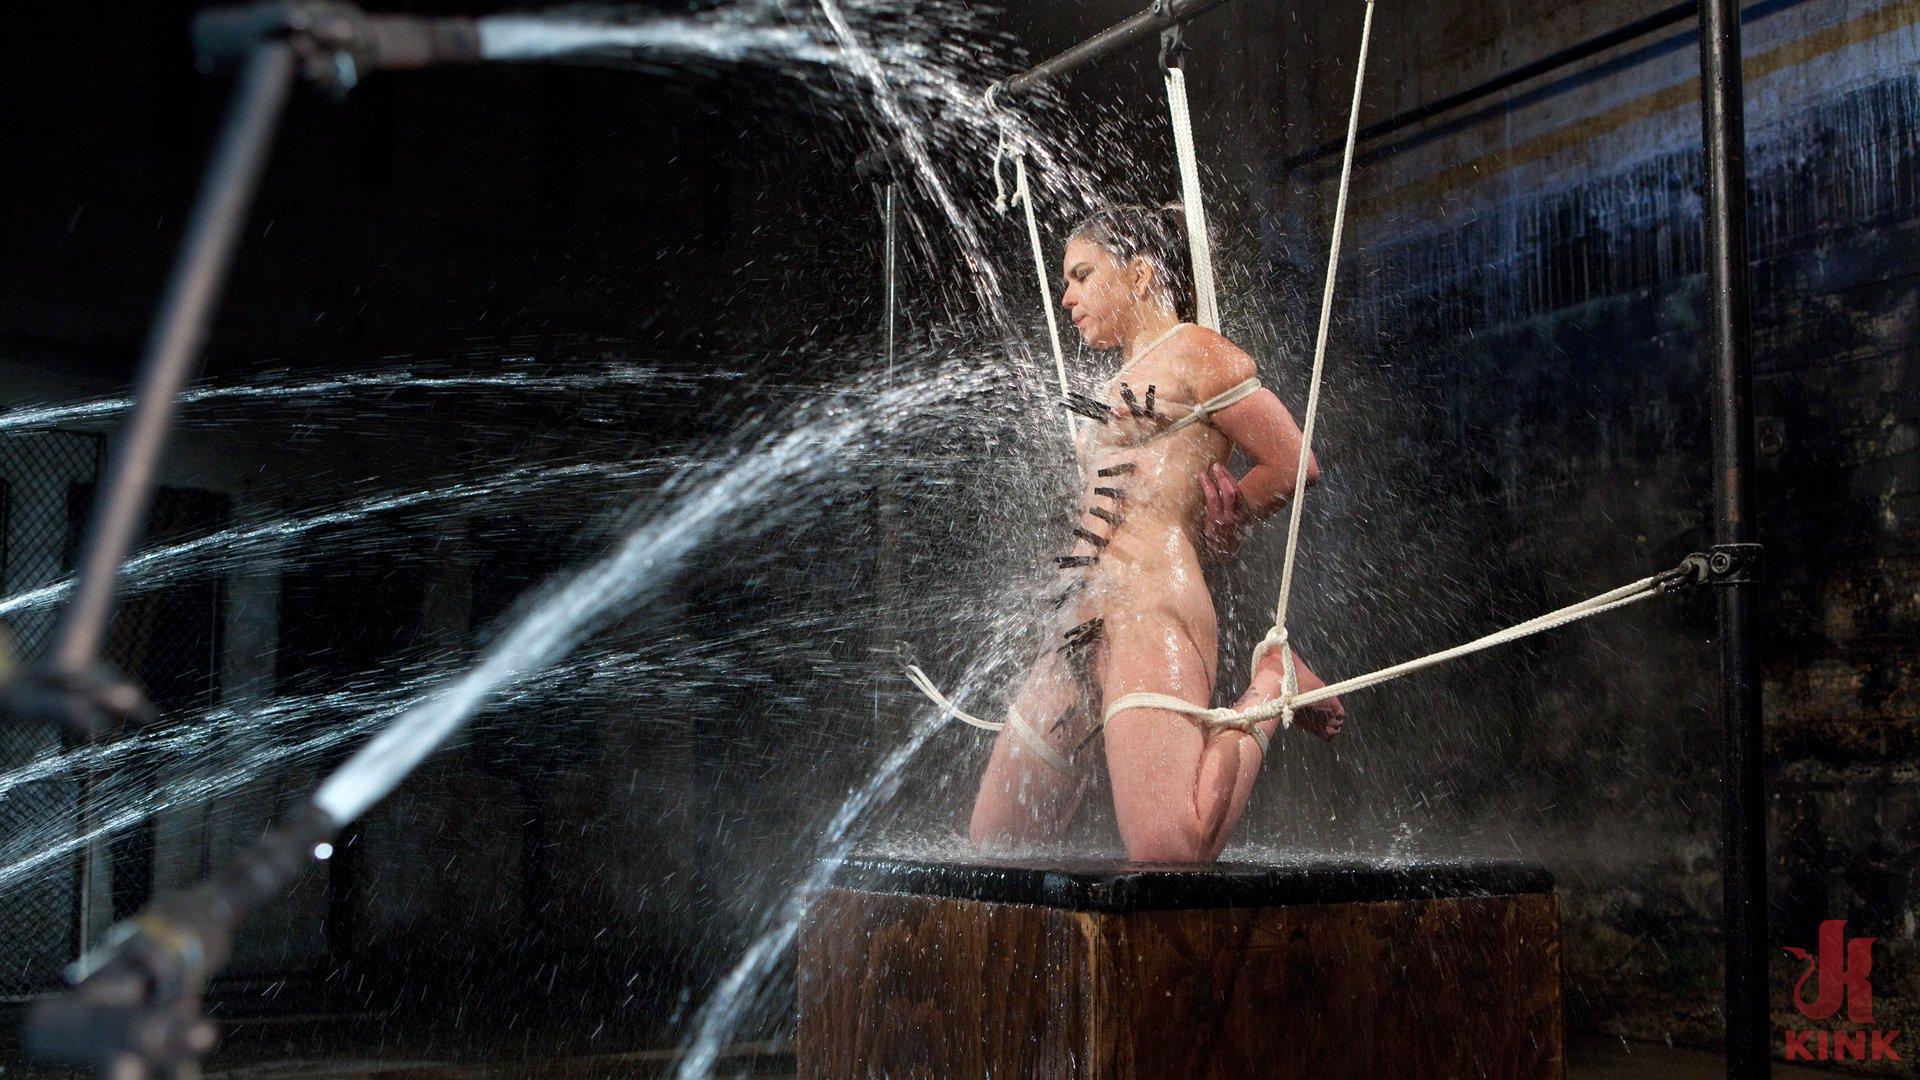 Dahlia suffers in extreme bondage 3